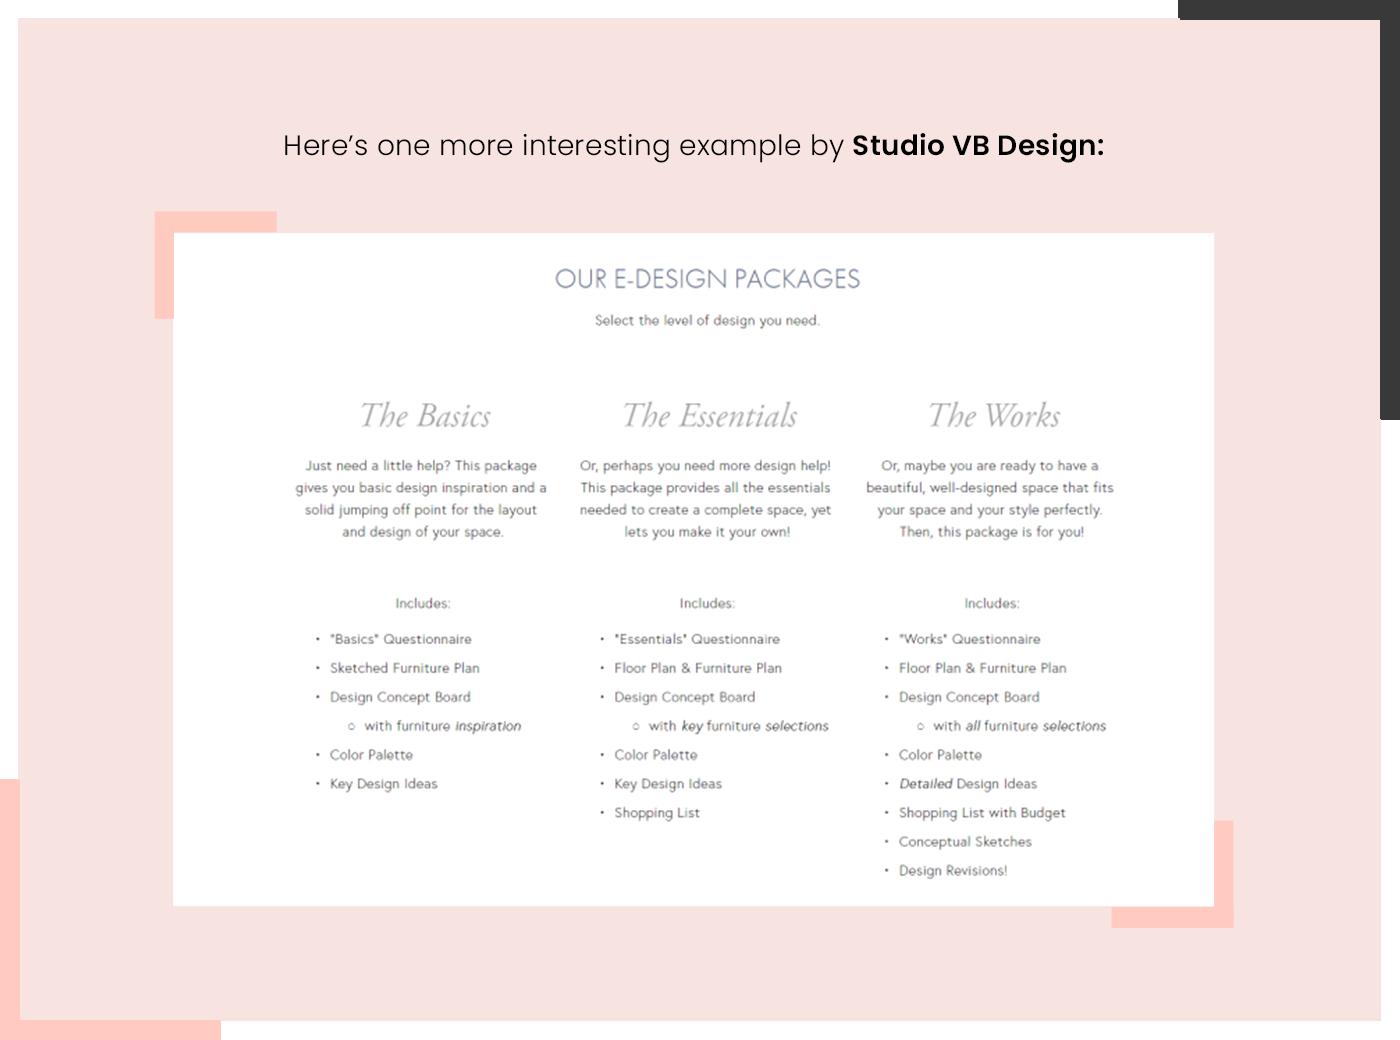 e-design packages by studio VB design